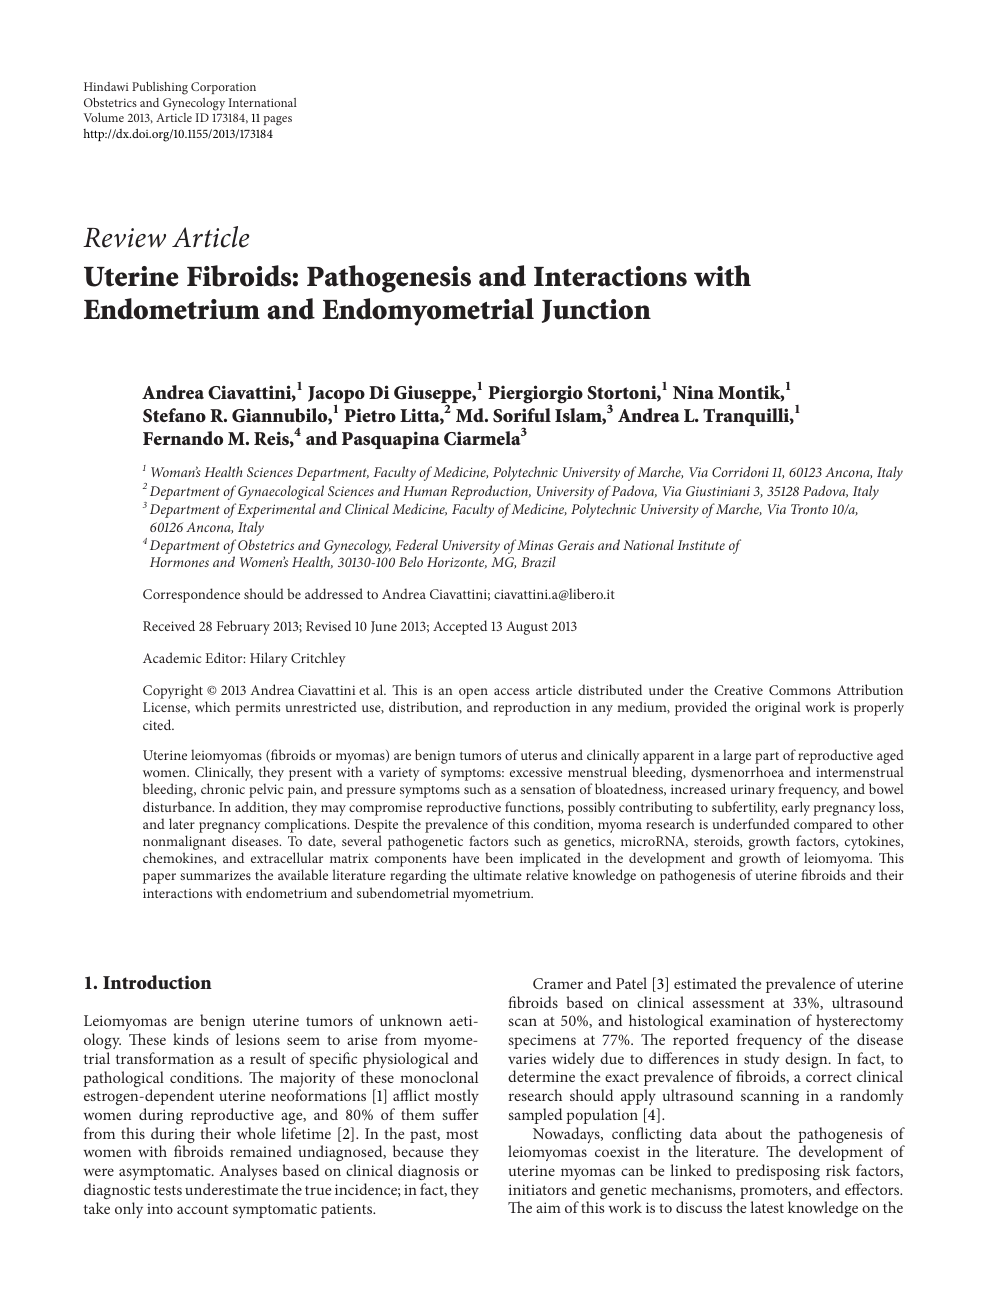 Pathogenesis Endometrium With Interactions Uterine And Fibroids